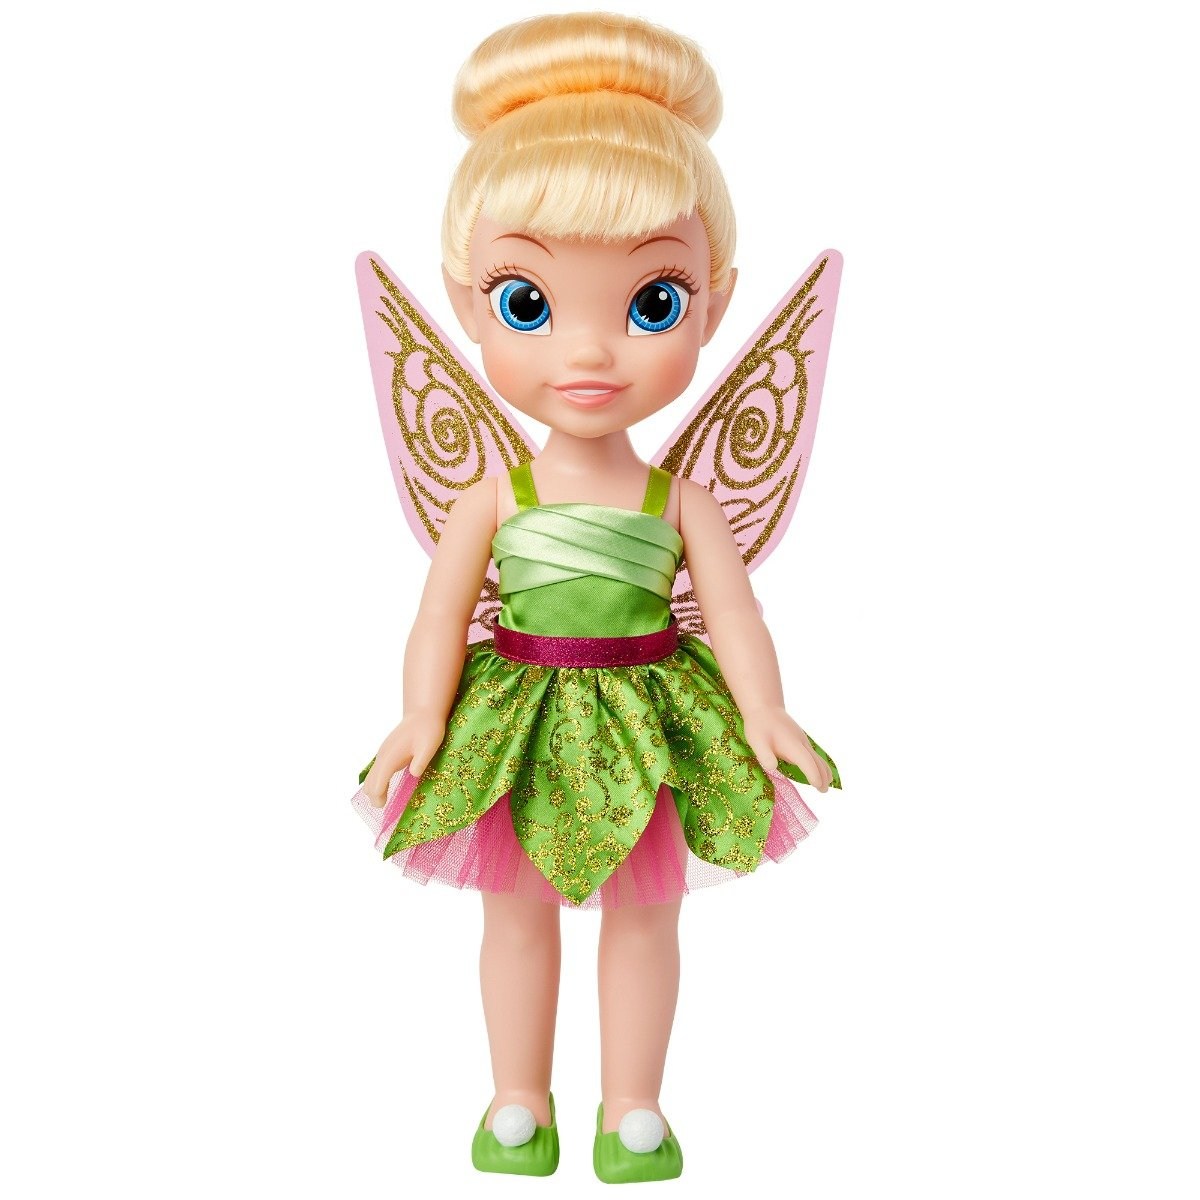 Papusa Disney Fairies, Tinker Bell, 35 cm